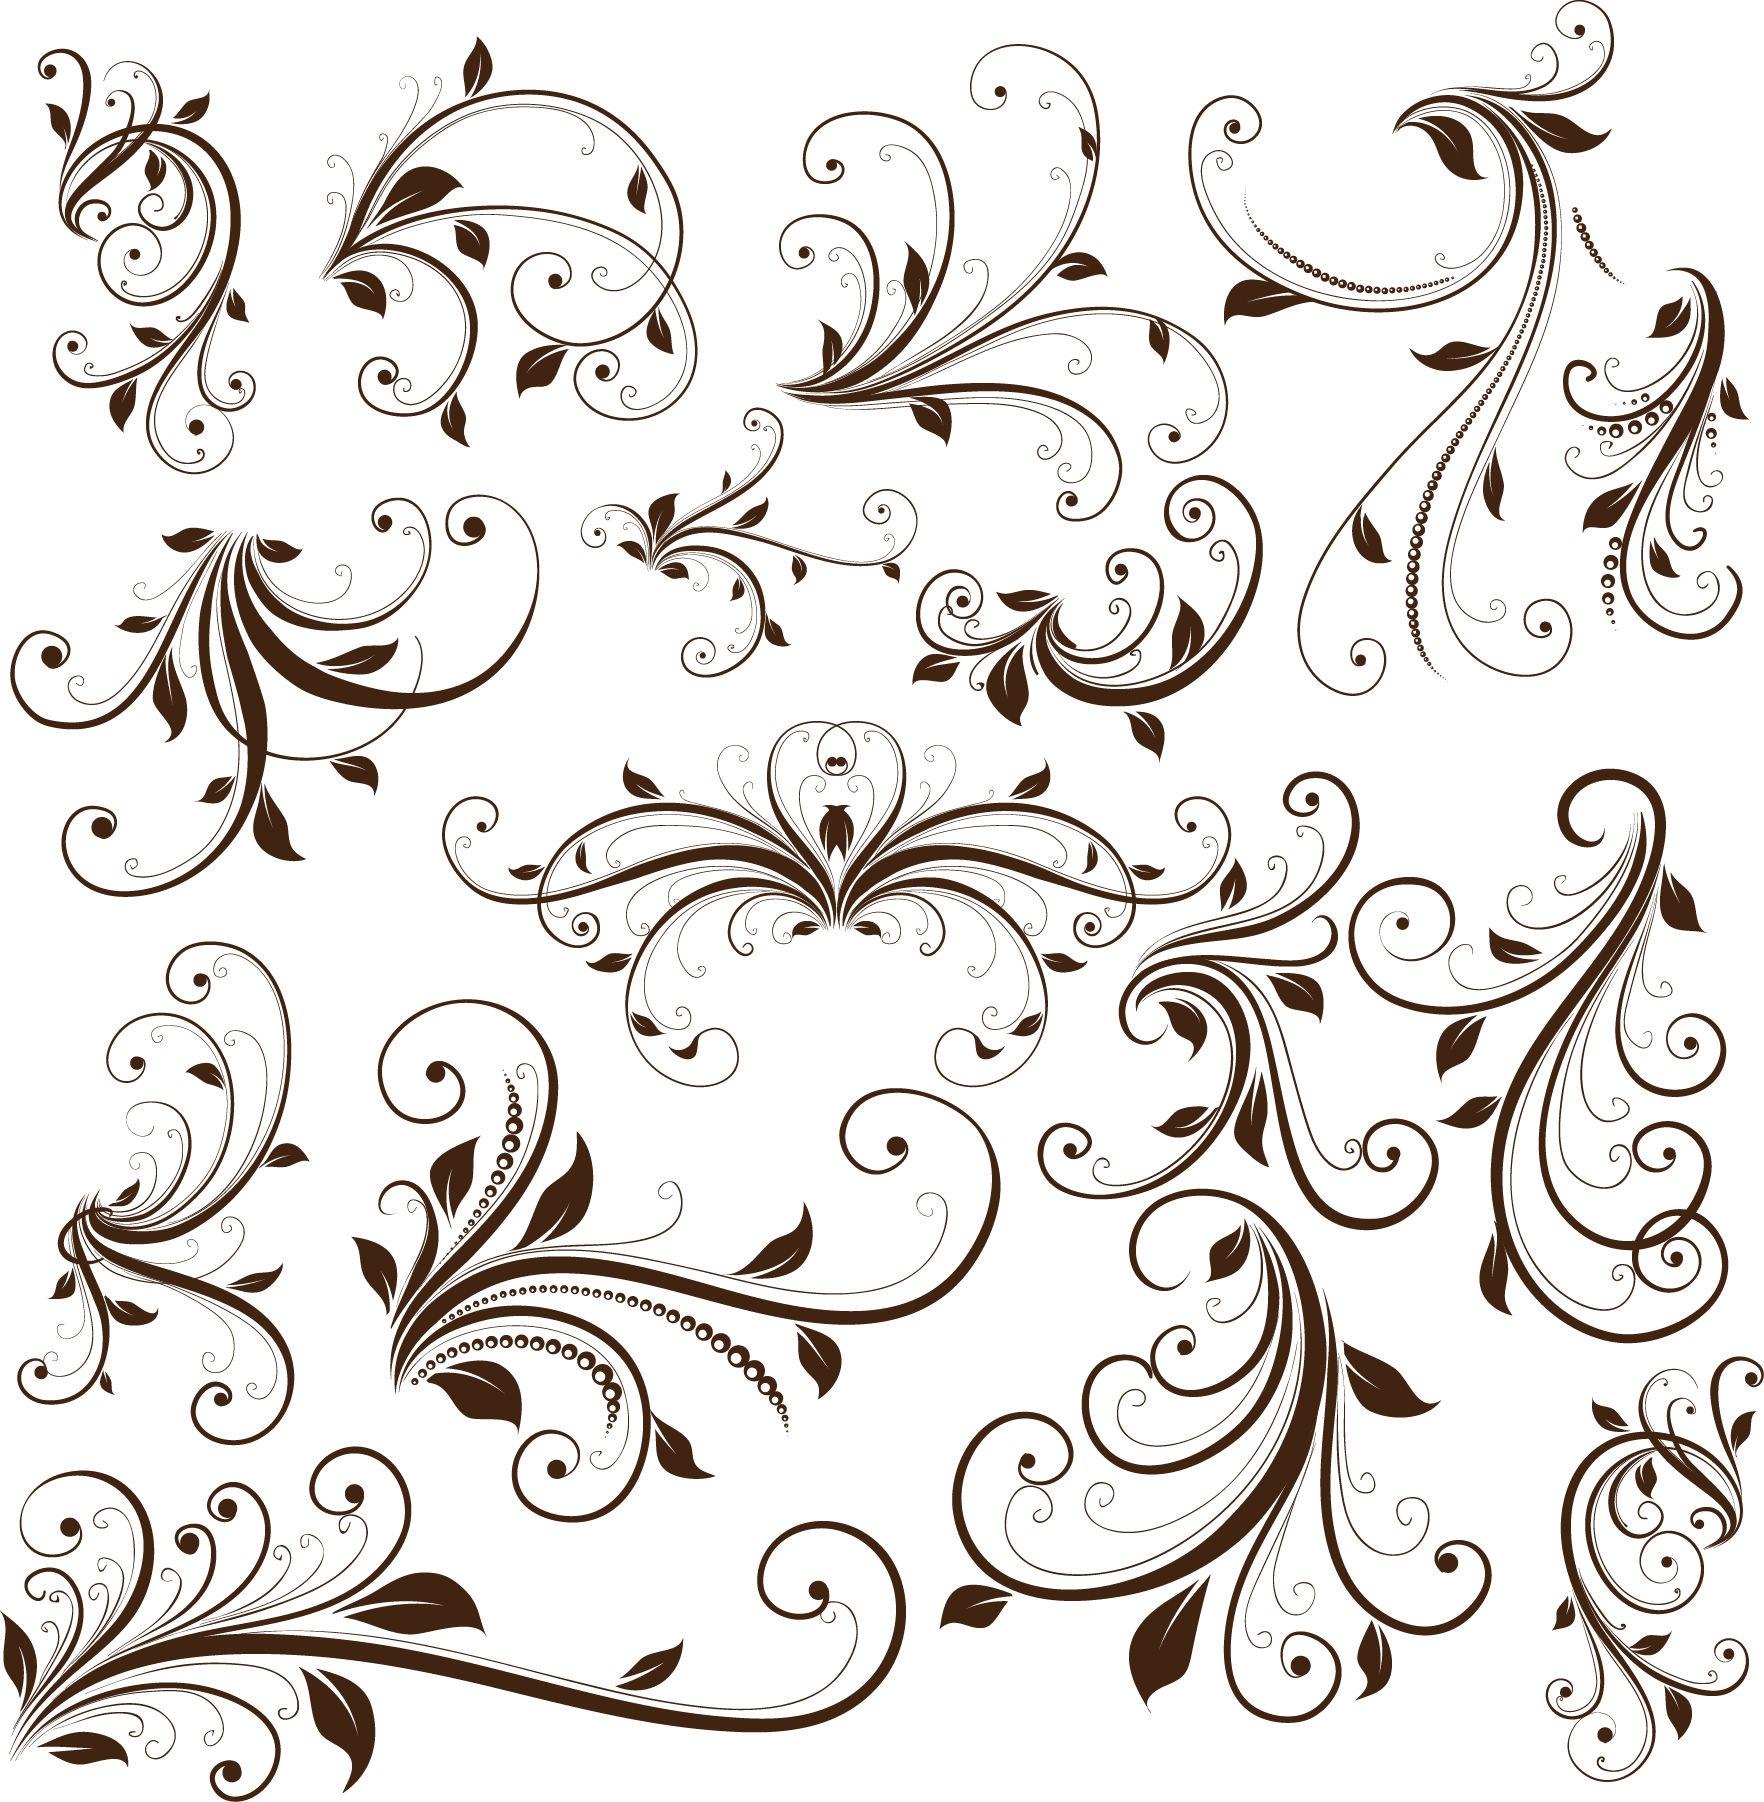 18 Design Swirl Floral Vector Art Images